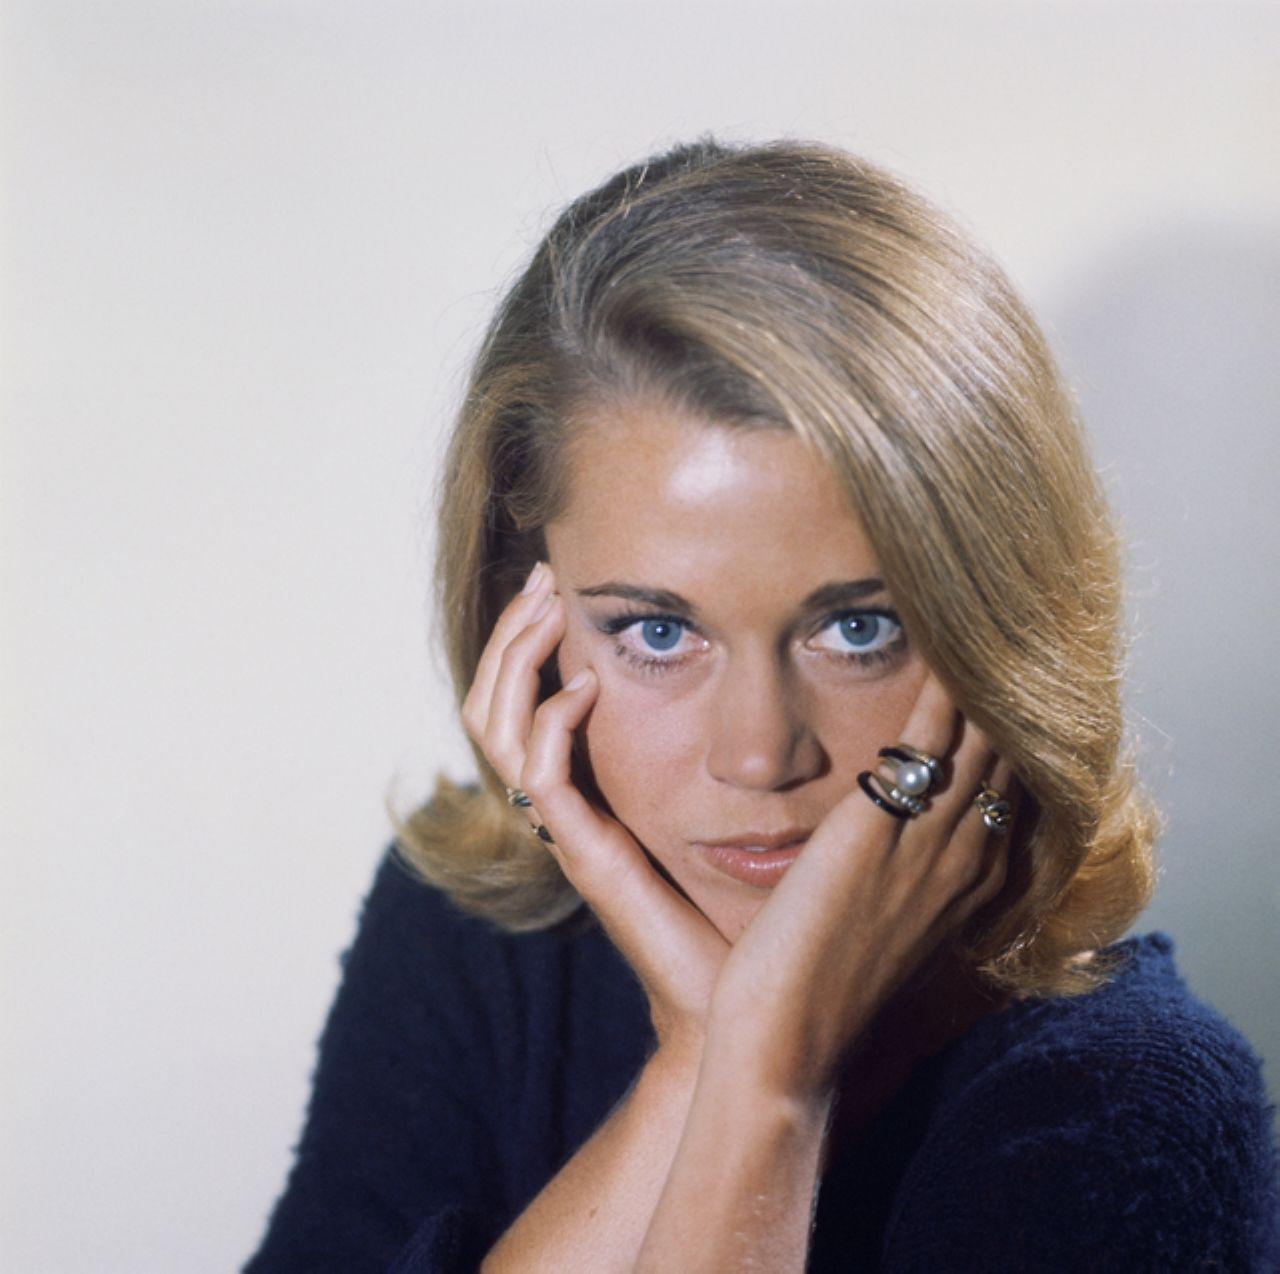 Maria Amapola Cabase (b.1948),Aloma Wright Adult clips Karen Summer,Sarah Lahbati (b. 1993)